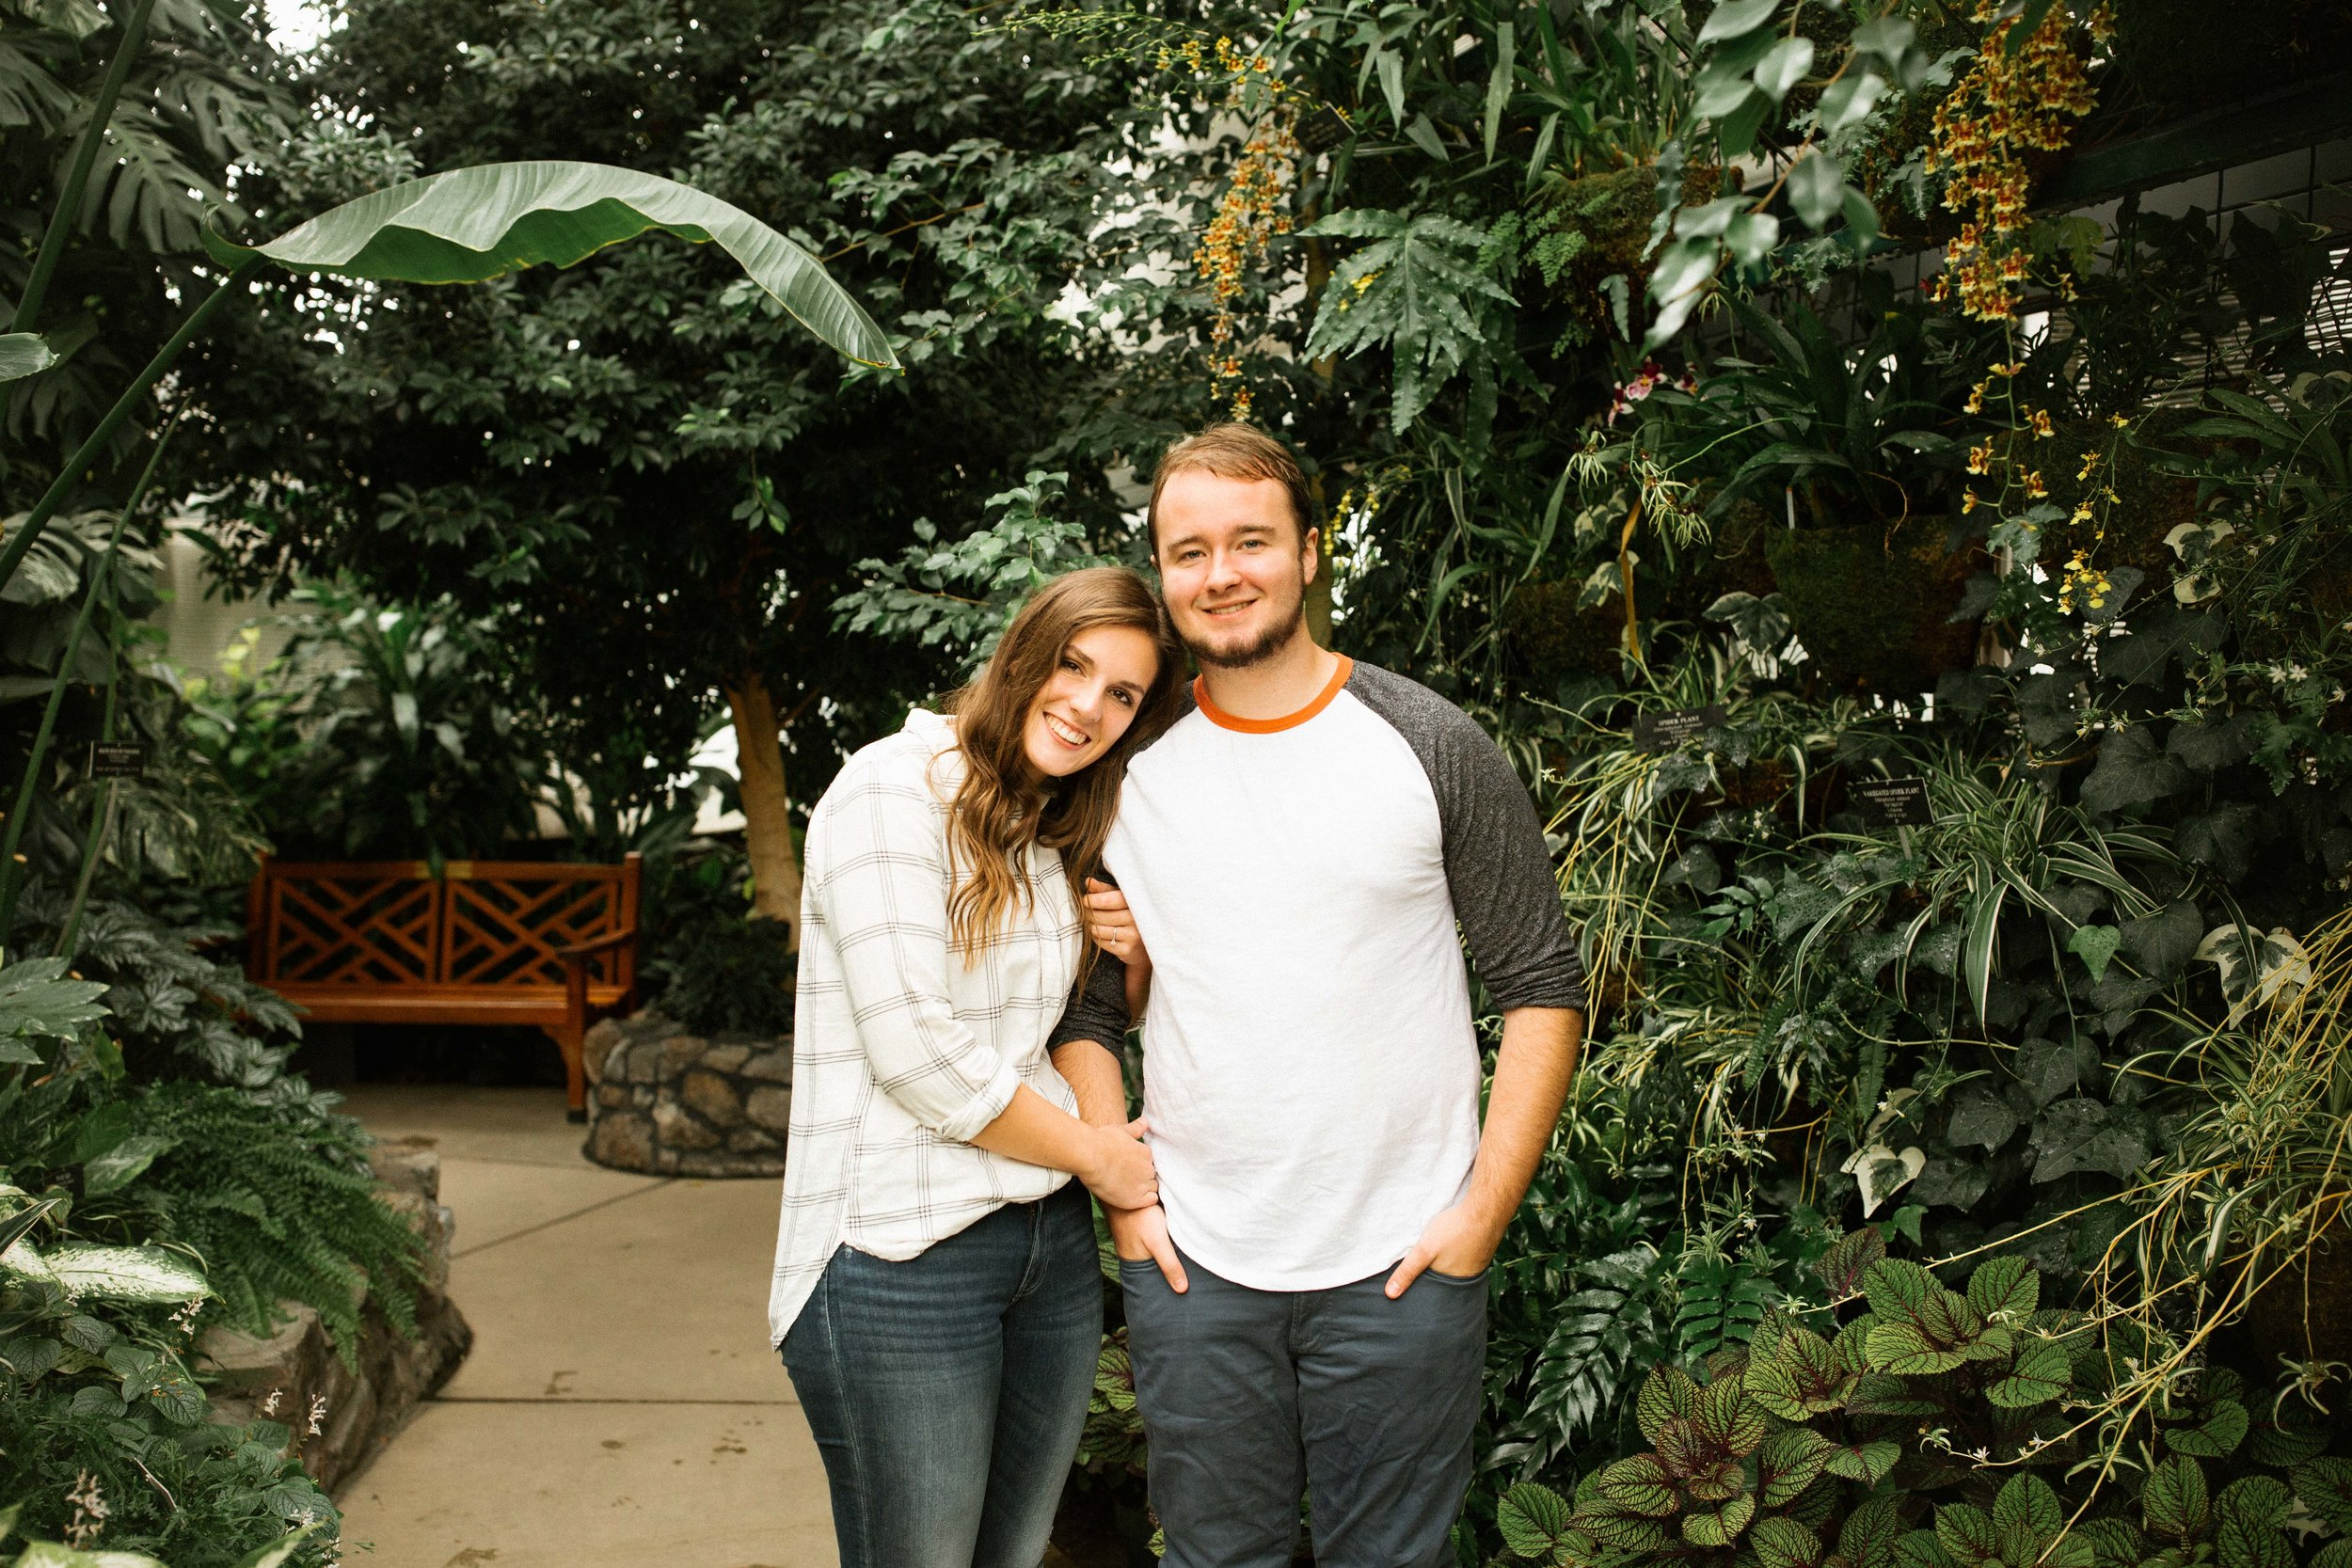 Madi&Garrett-Engaged!BLOG-1.jpg